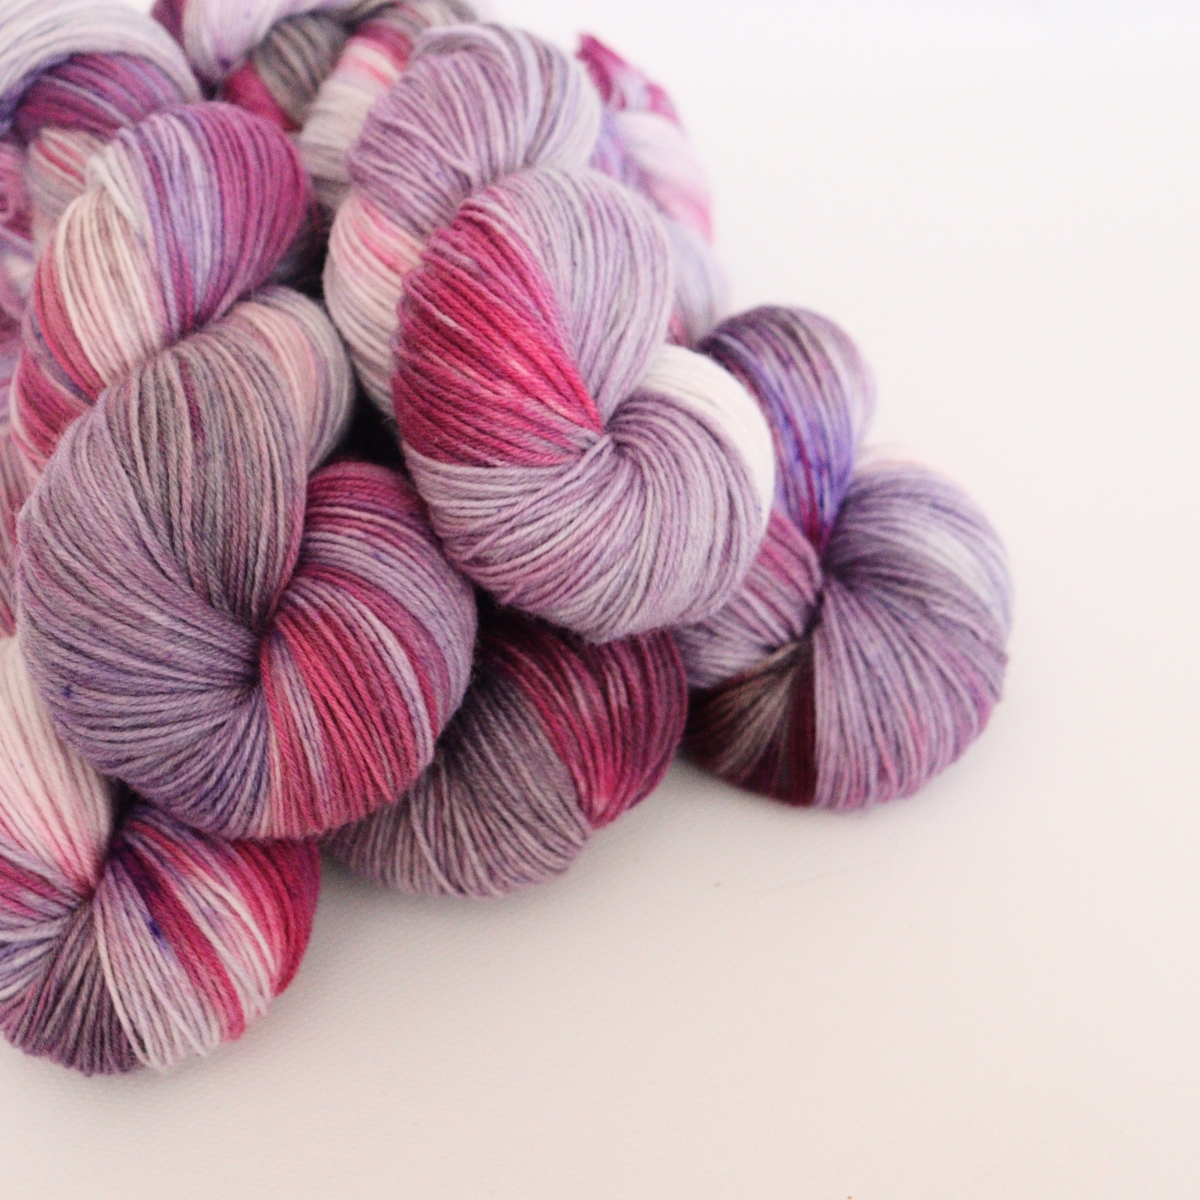 woodico.pro hand dyed yarn 059 2 1200x1200 - Hand dyed yarn / 059